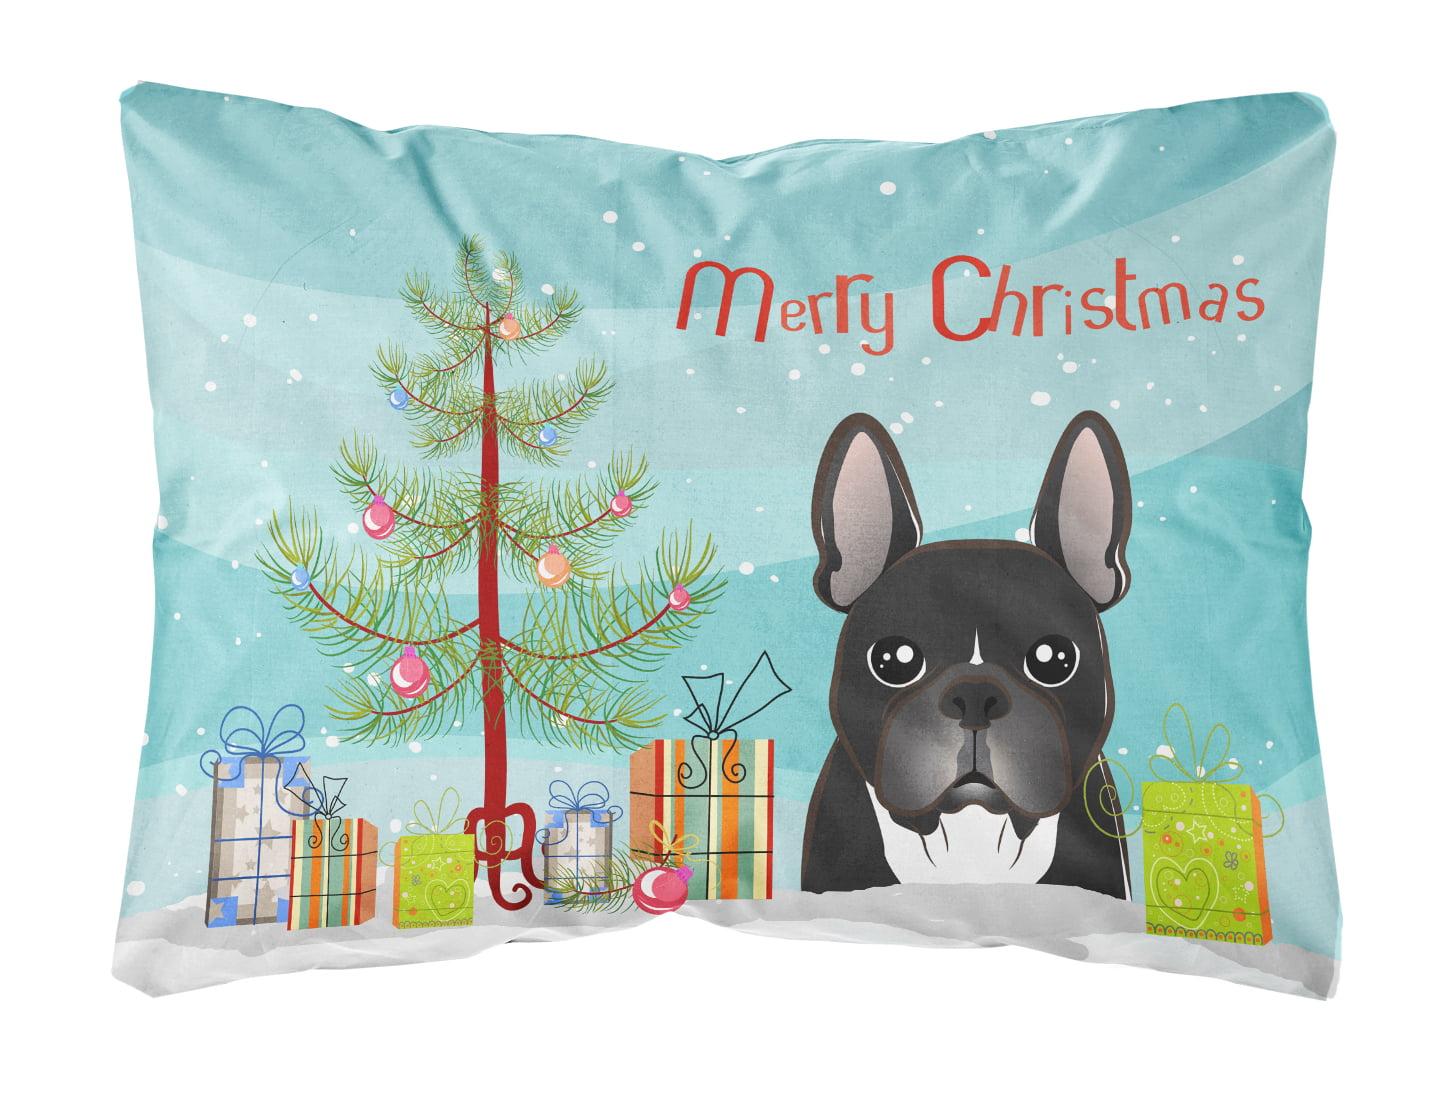 Christmas Tree and French Bulldog Fabric Decorative Pillow by Caroline's Treasures